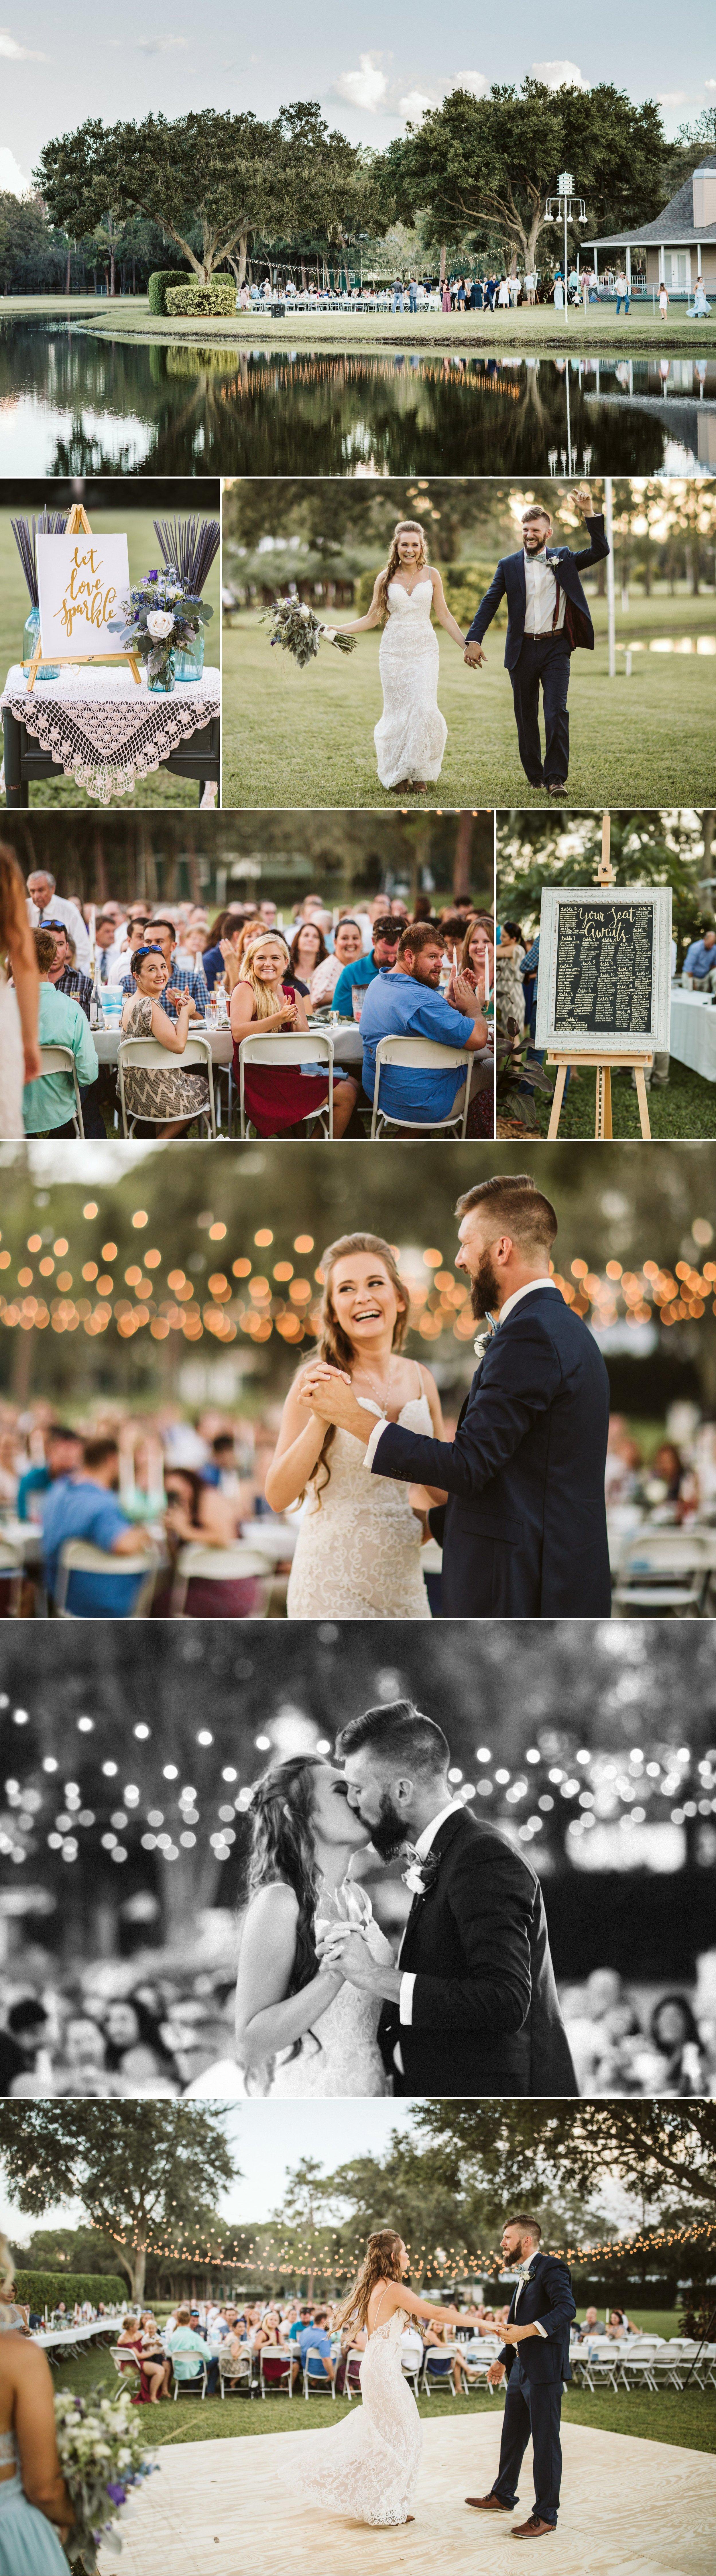 Romantic Floral Outdoor Field Chapel Wedding- Sarasota Florida- Courtney & Isaac22.jpg